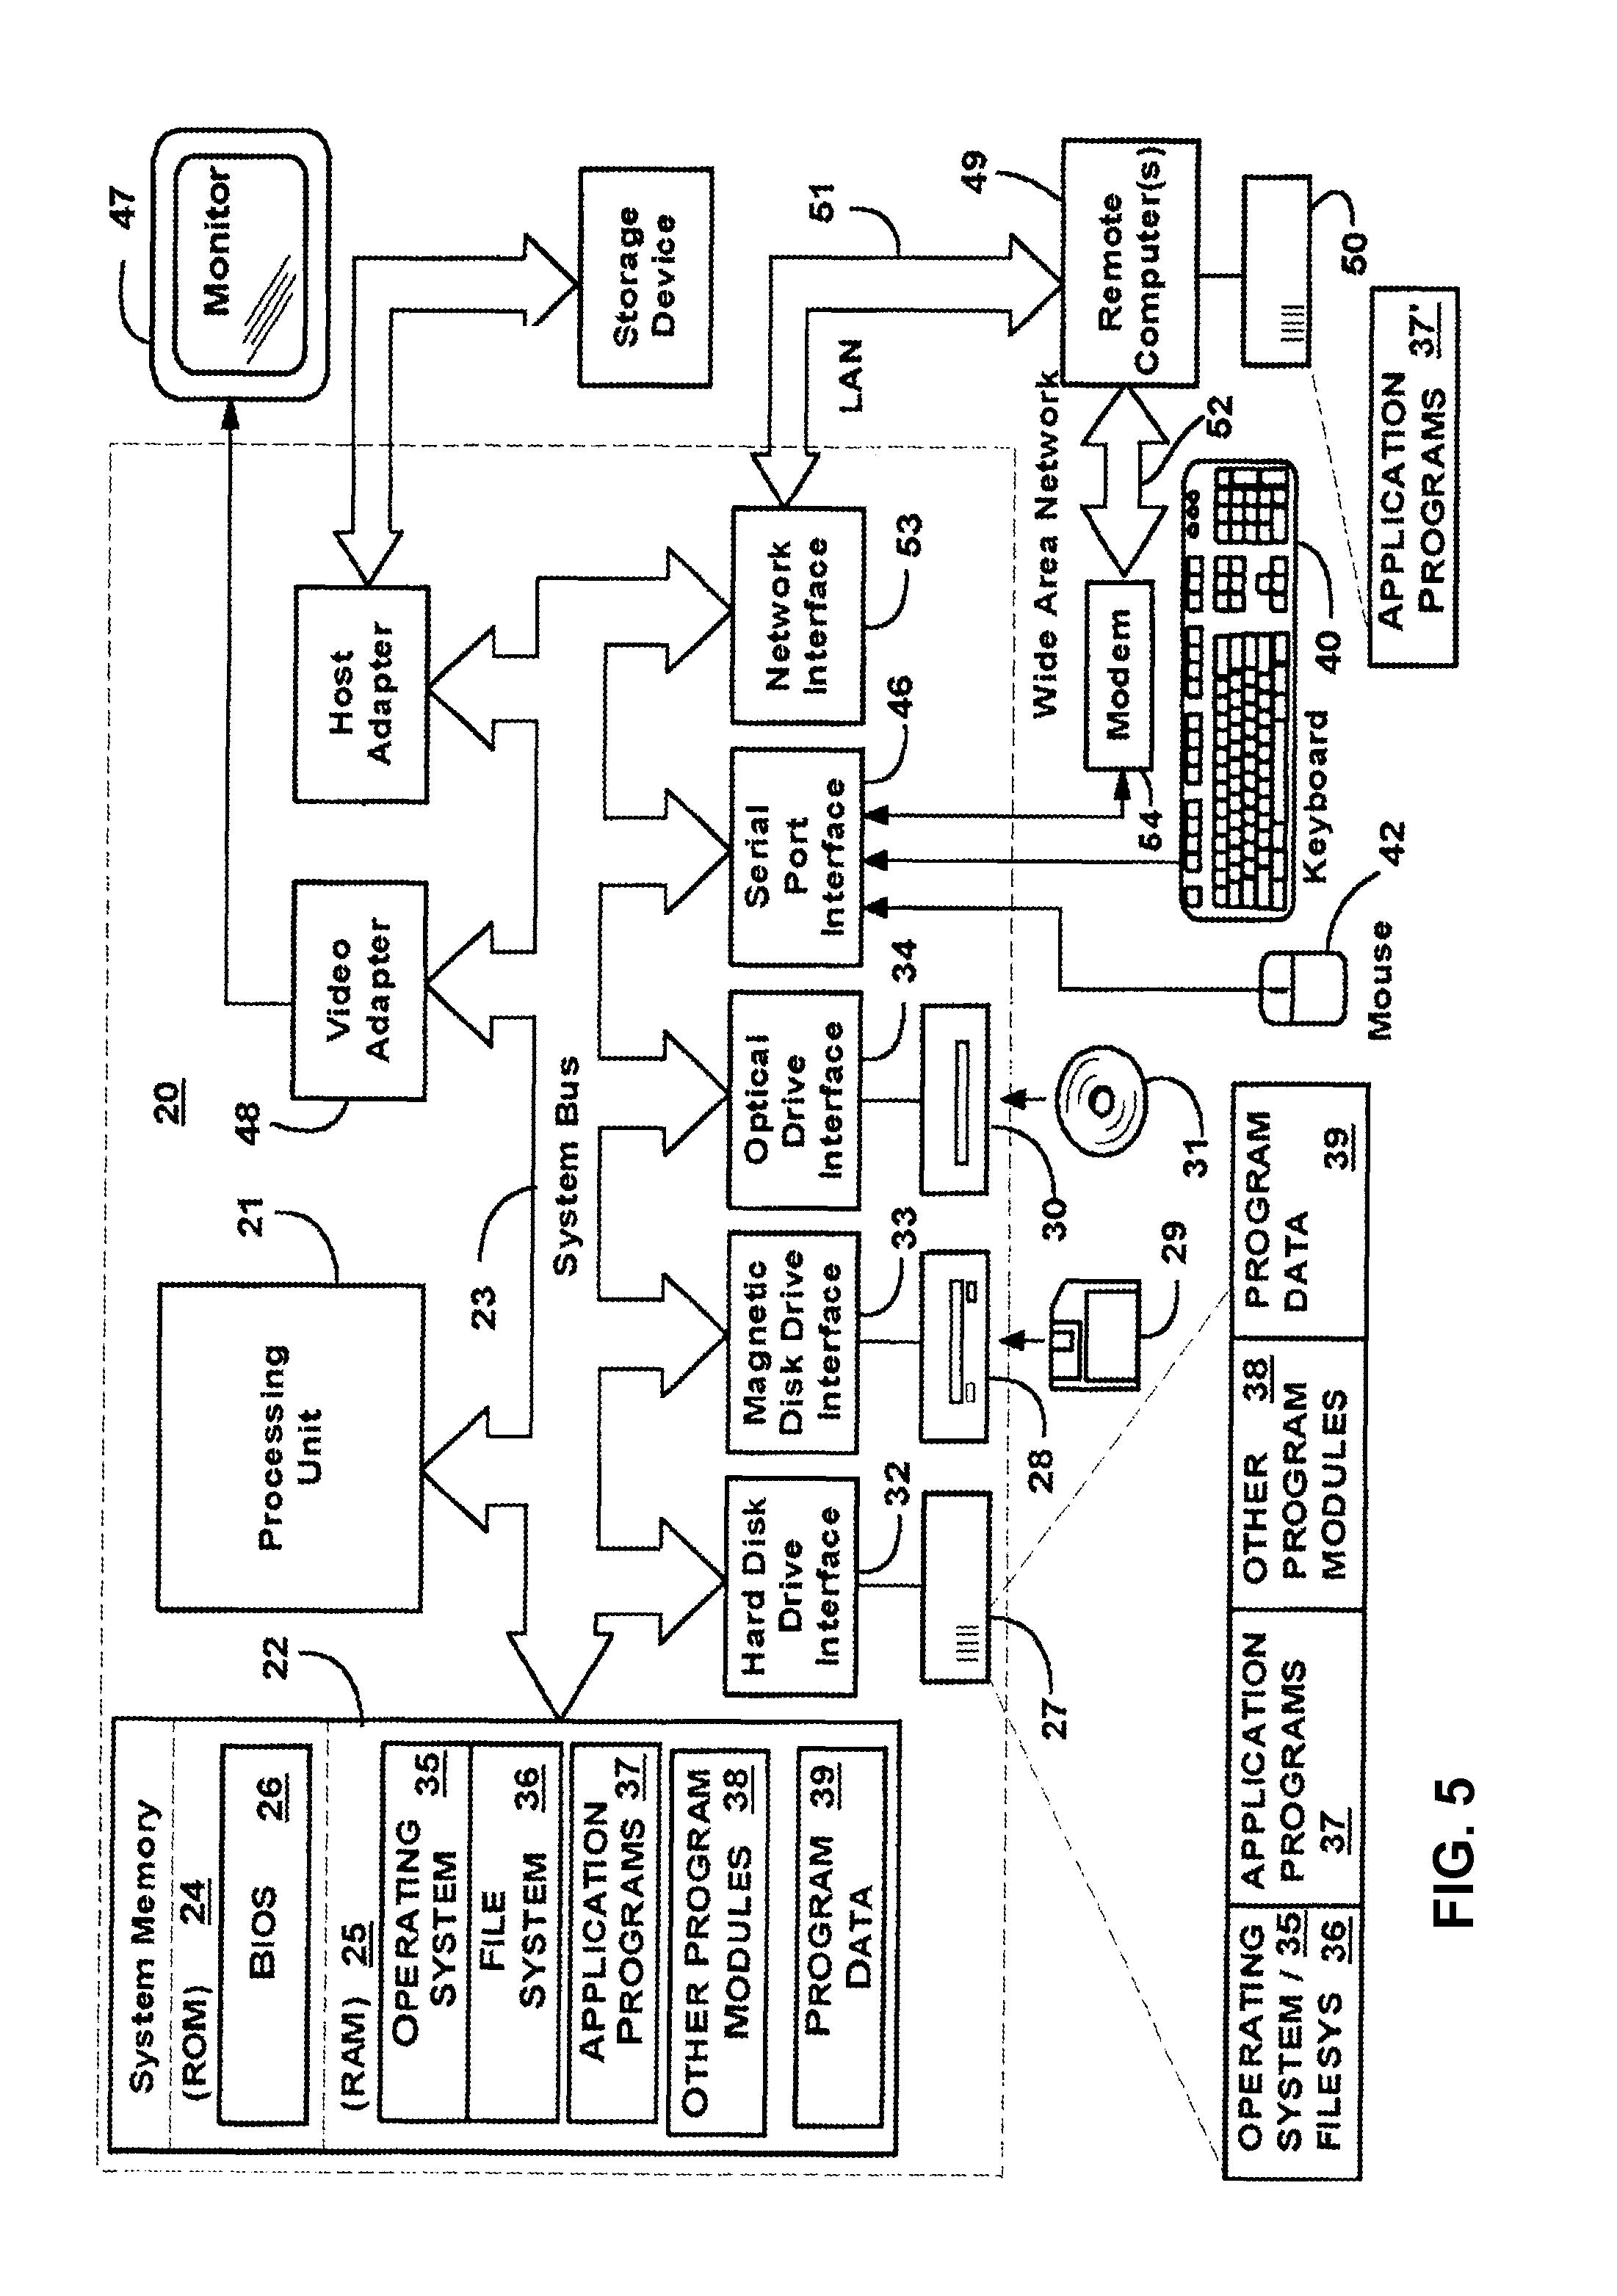 Nexon Car Alarm Wiring Diagram - Guitar Wiring Diagrams No Tone -  ezgobattery.yenpancane.jeanjaures37.fr   Gsd2030z02ww Ge Wiring Schematic      Wiring Diagram Resource